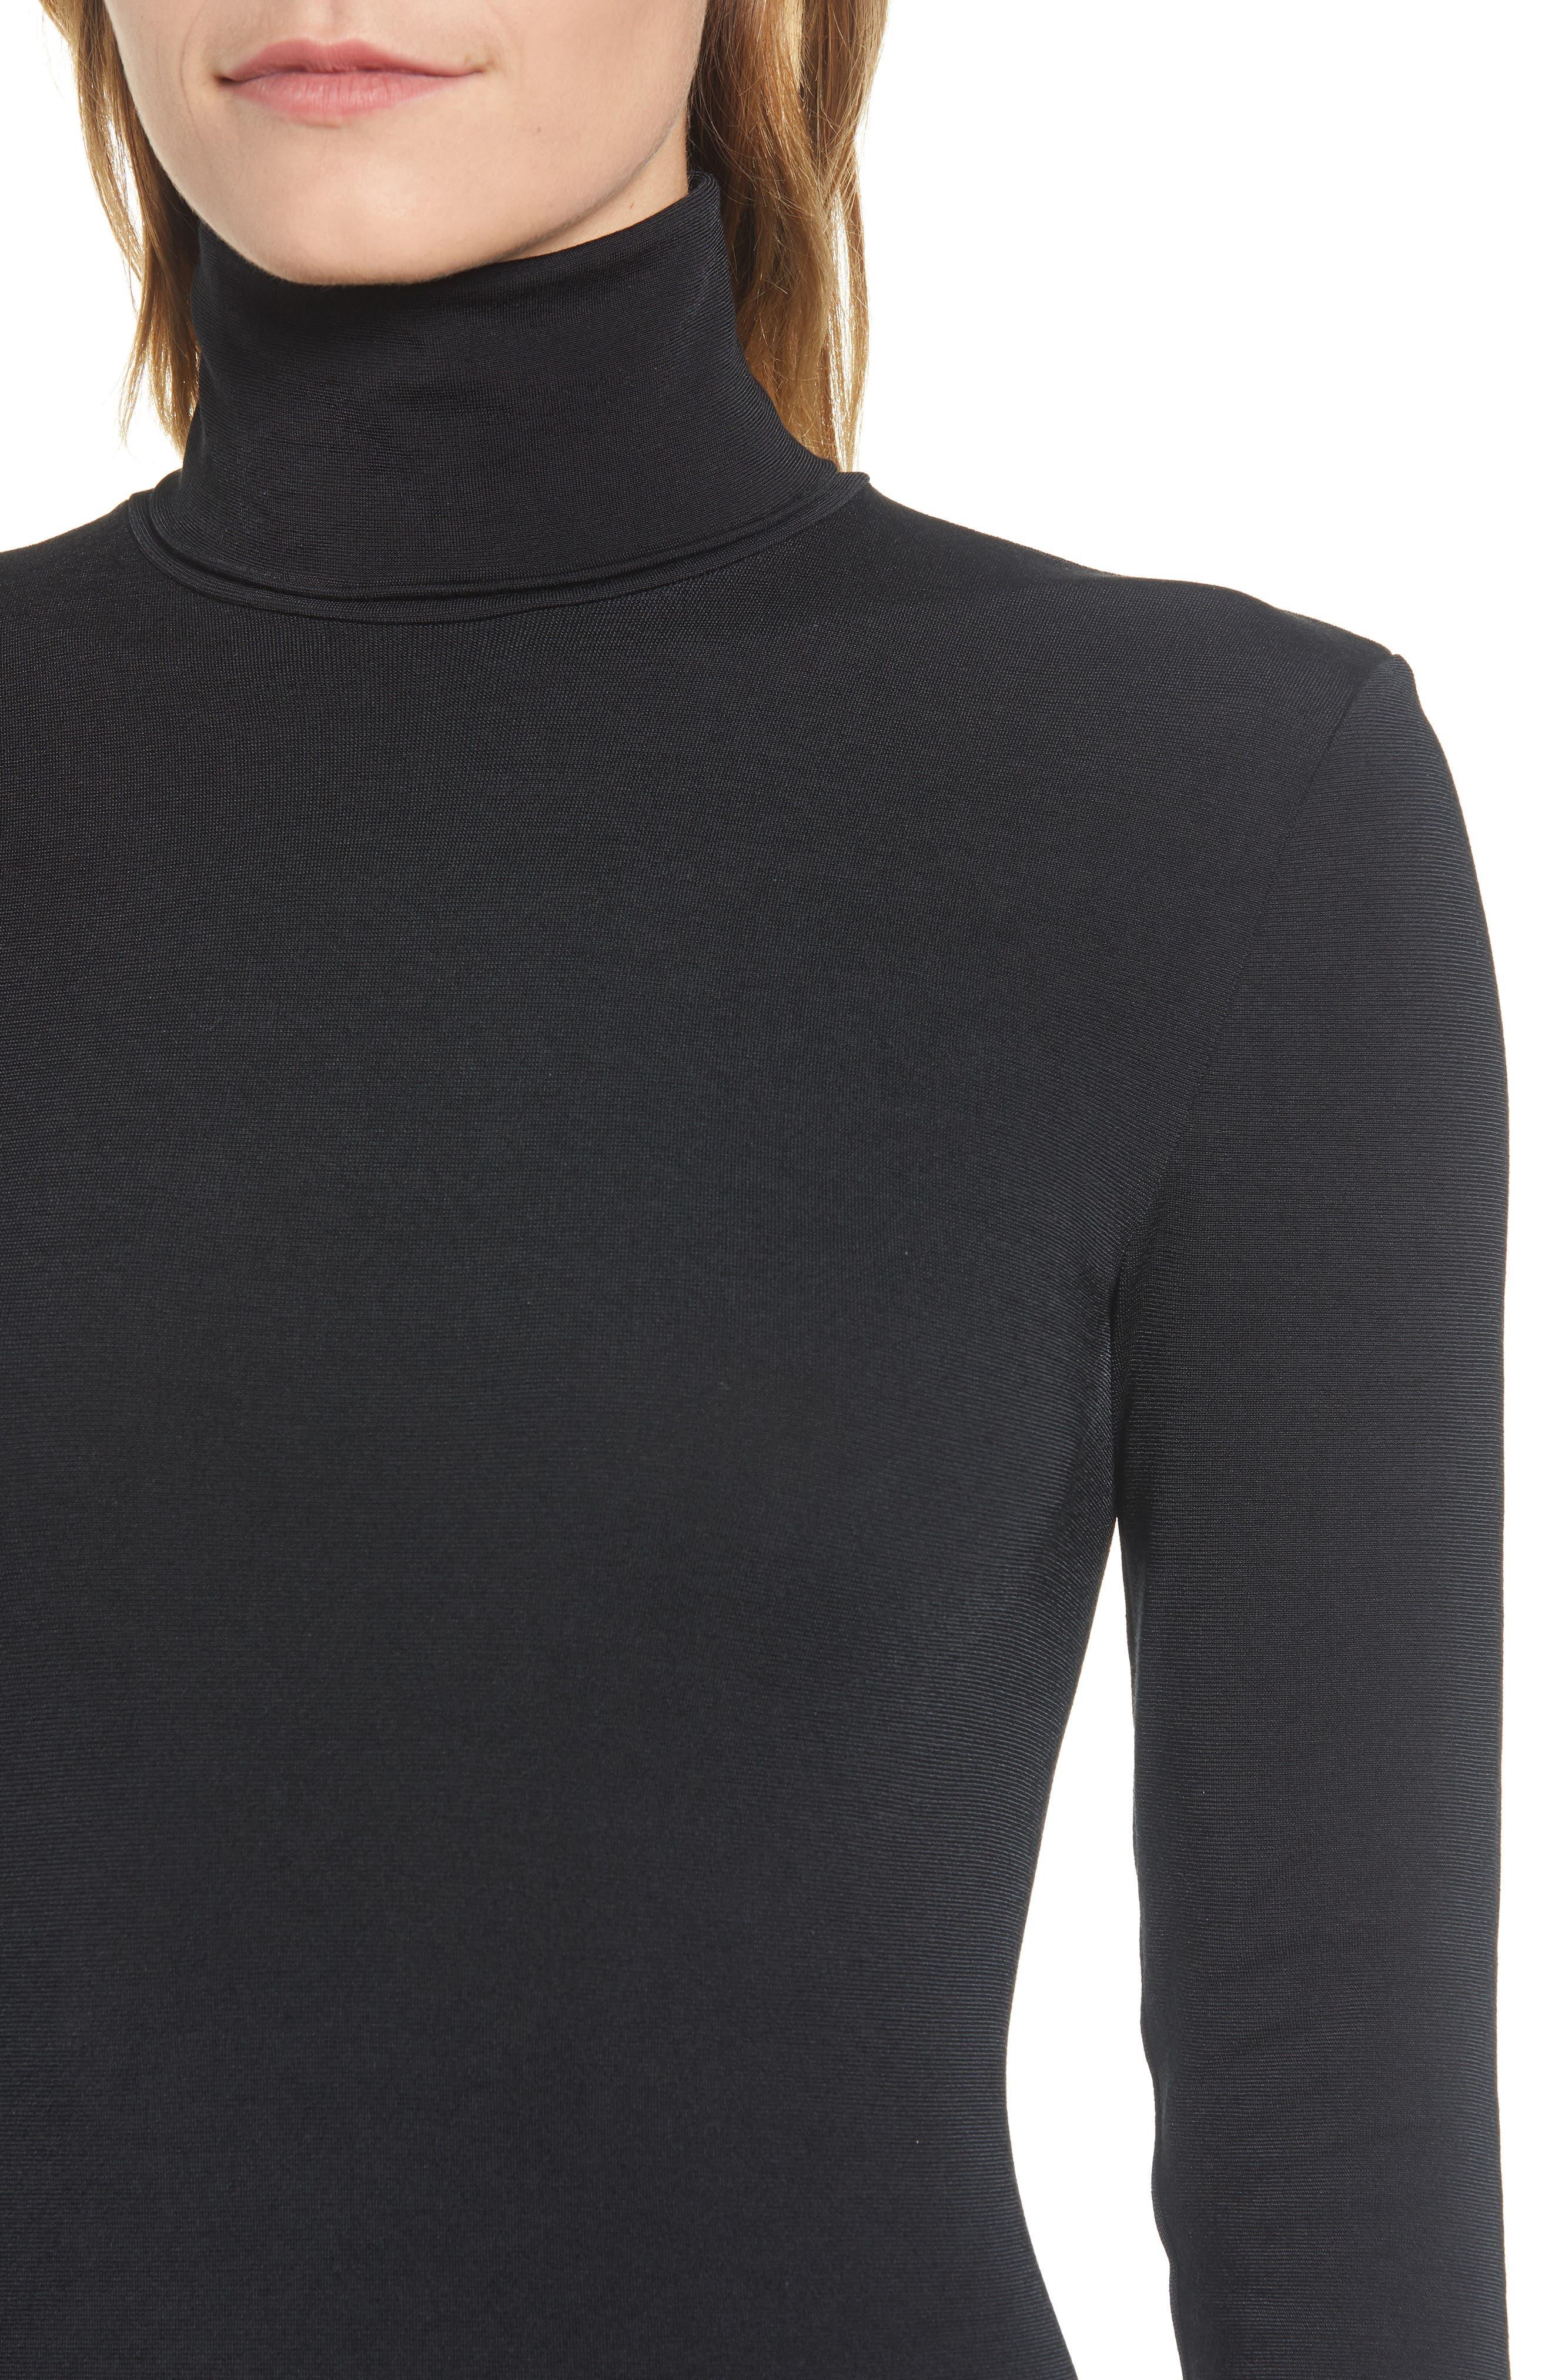 WOLFORD,                             'Colorado' Bodysuit,                             Alternate thumbnail 4, color,                             002